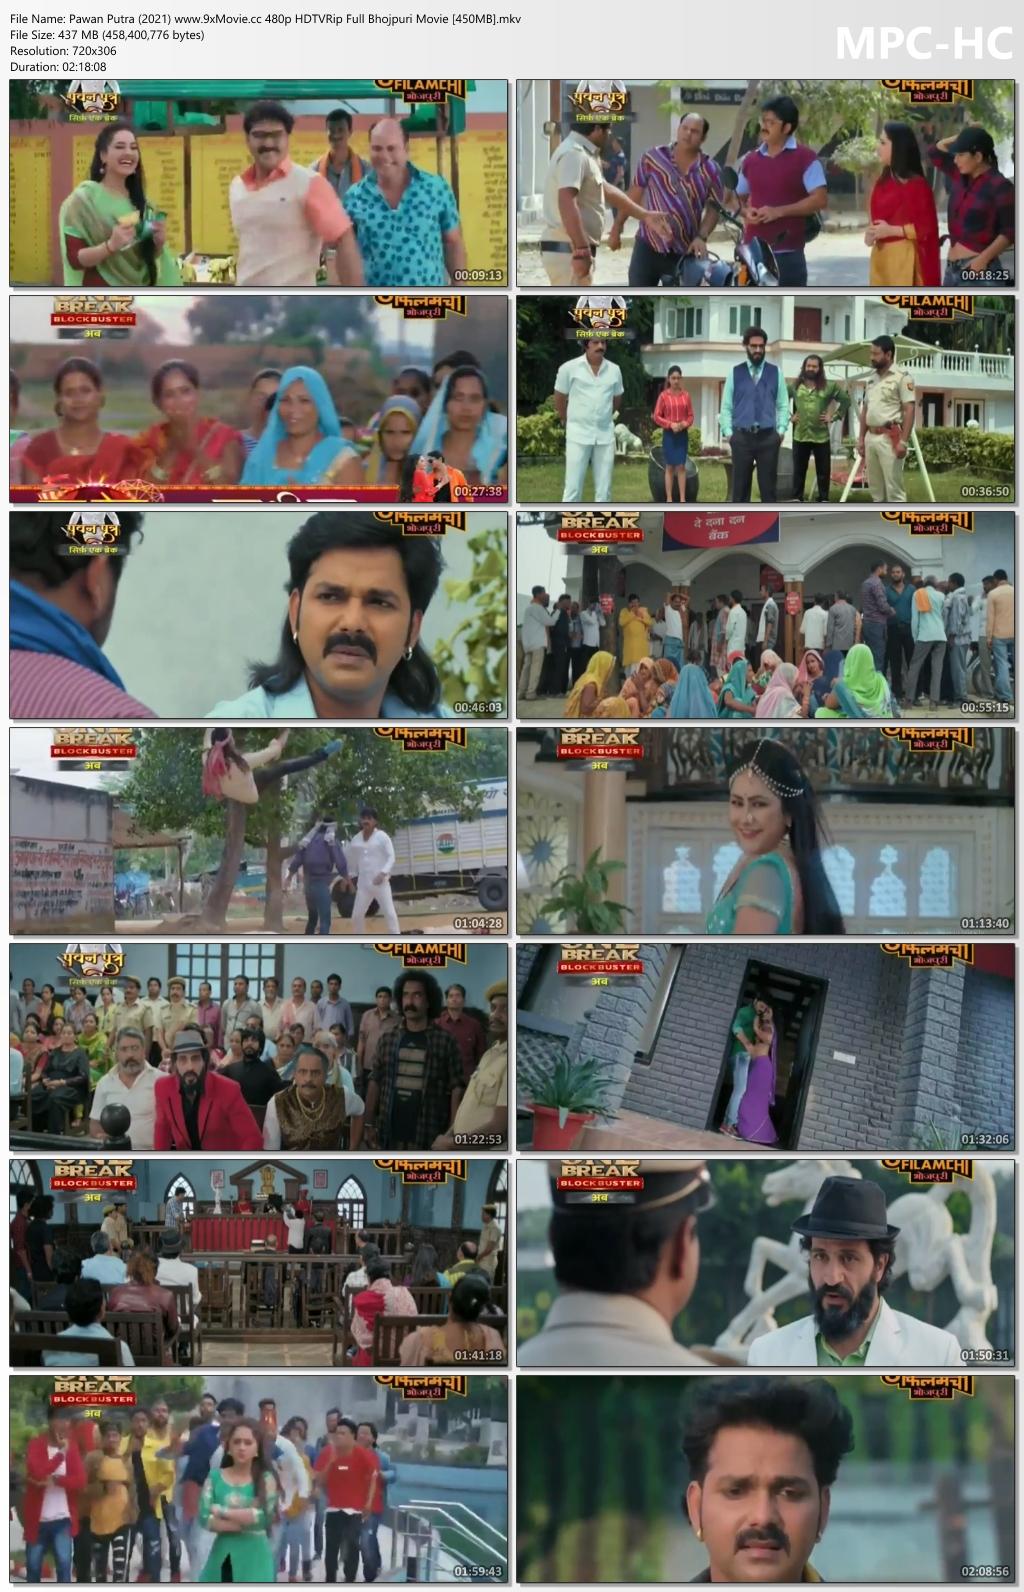 Pawan-Putra-2021-www-9x-Movie-cc-480p-HDTVRip-Full-Bhojpuri-Movie-450-MB-mkv